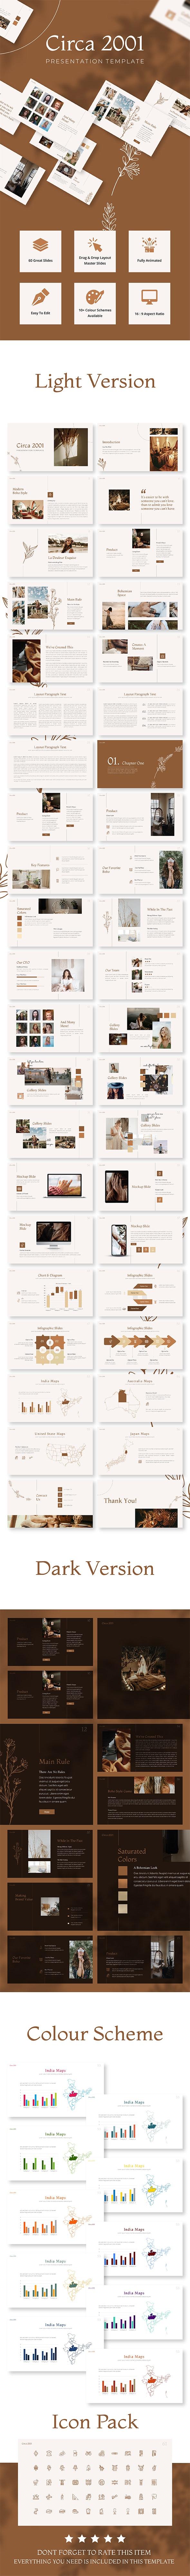 Circa 2001 Presentation Template - Business PowerPoint Templates